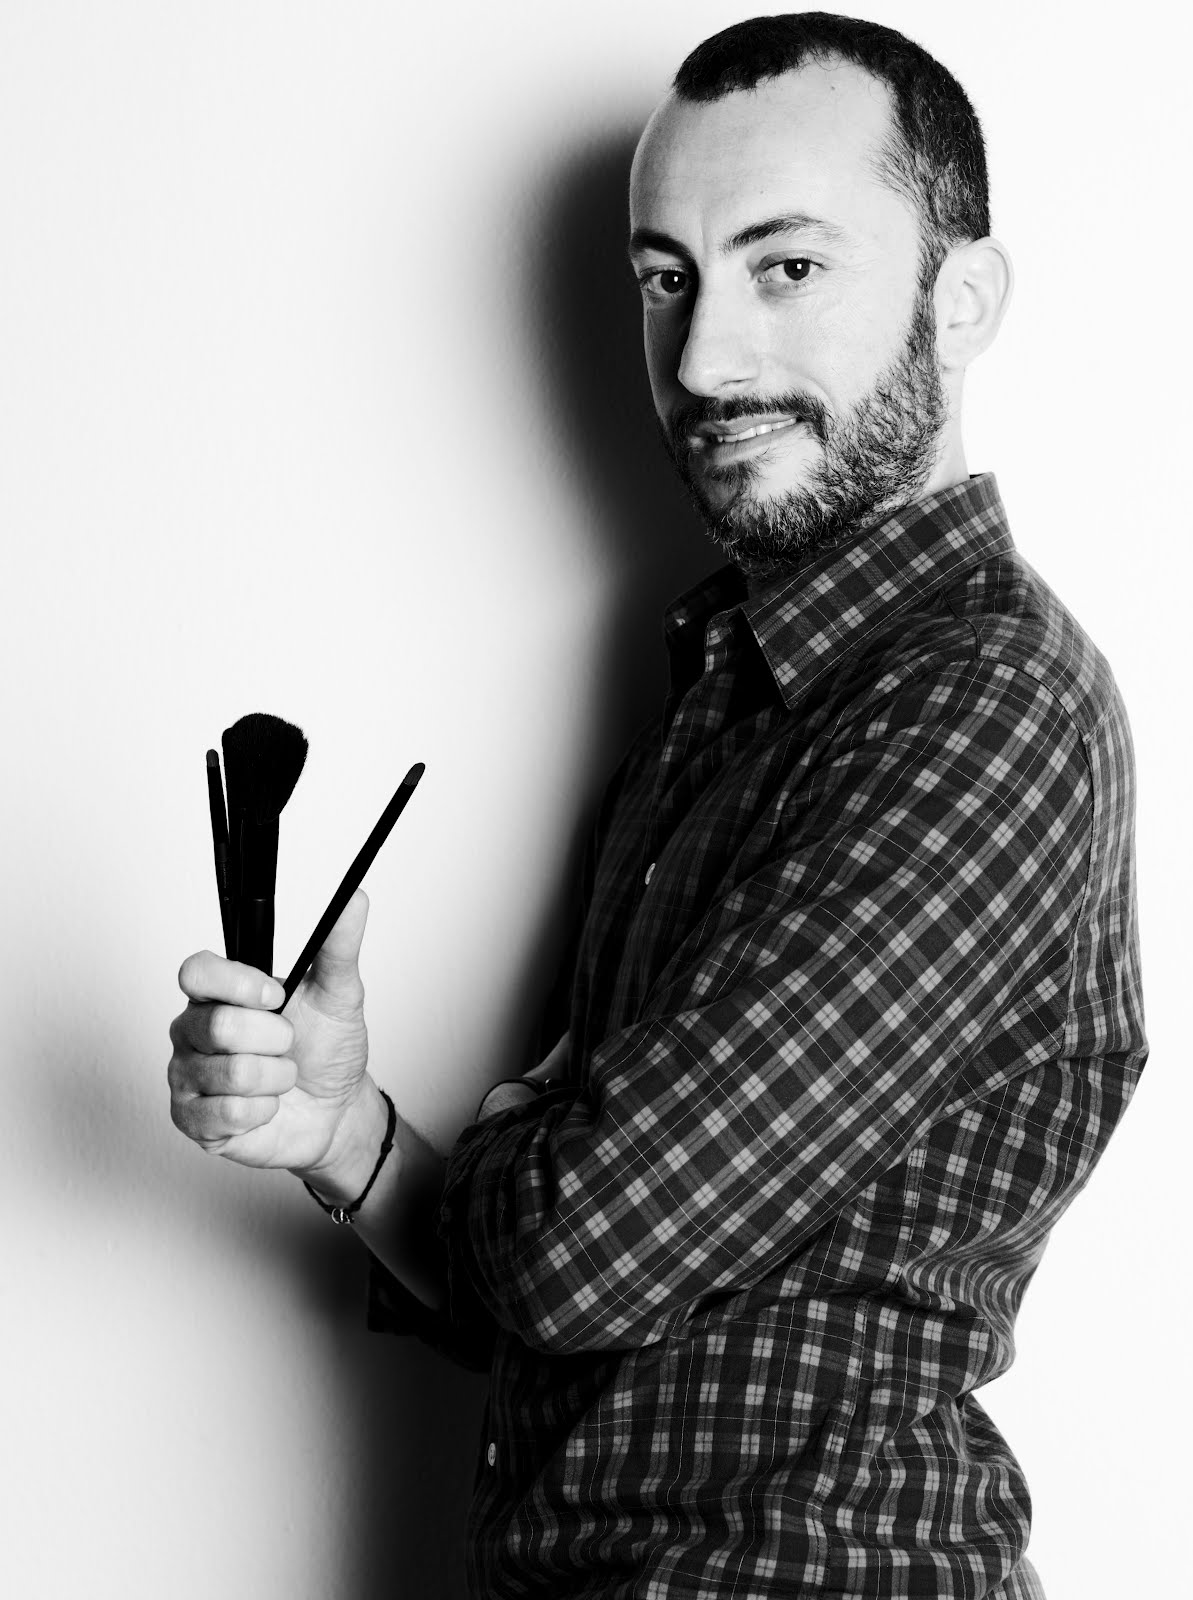 Entrevista con Eduardo Jimenez maquillador oficial de YVES SAINT LAURENT en exclusiva para el blog de Cayetana